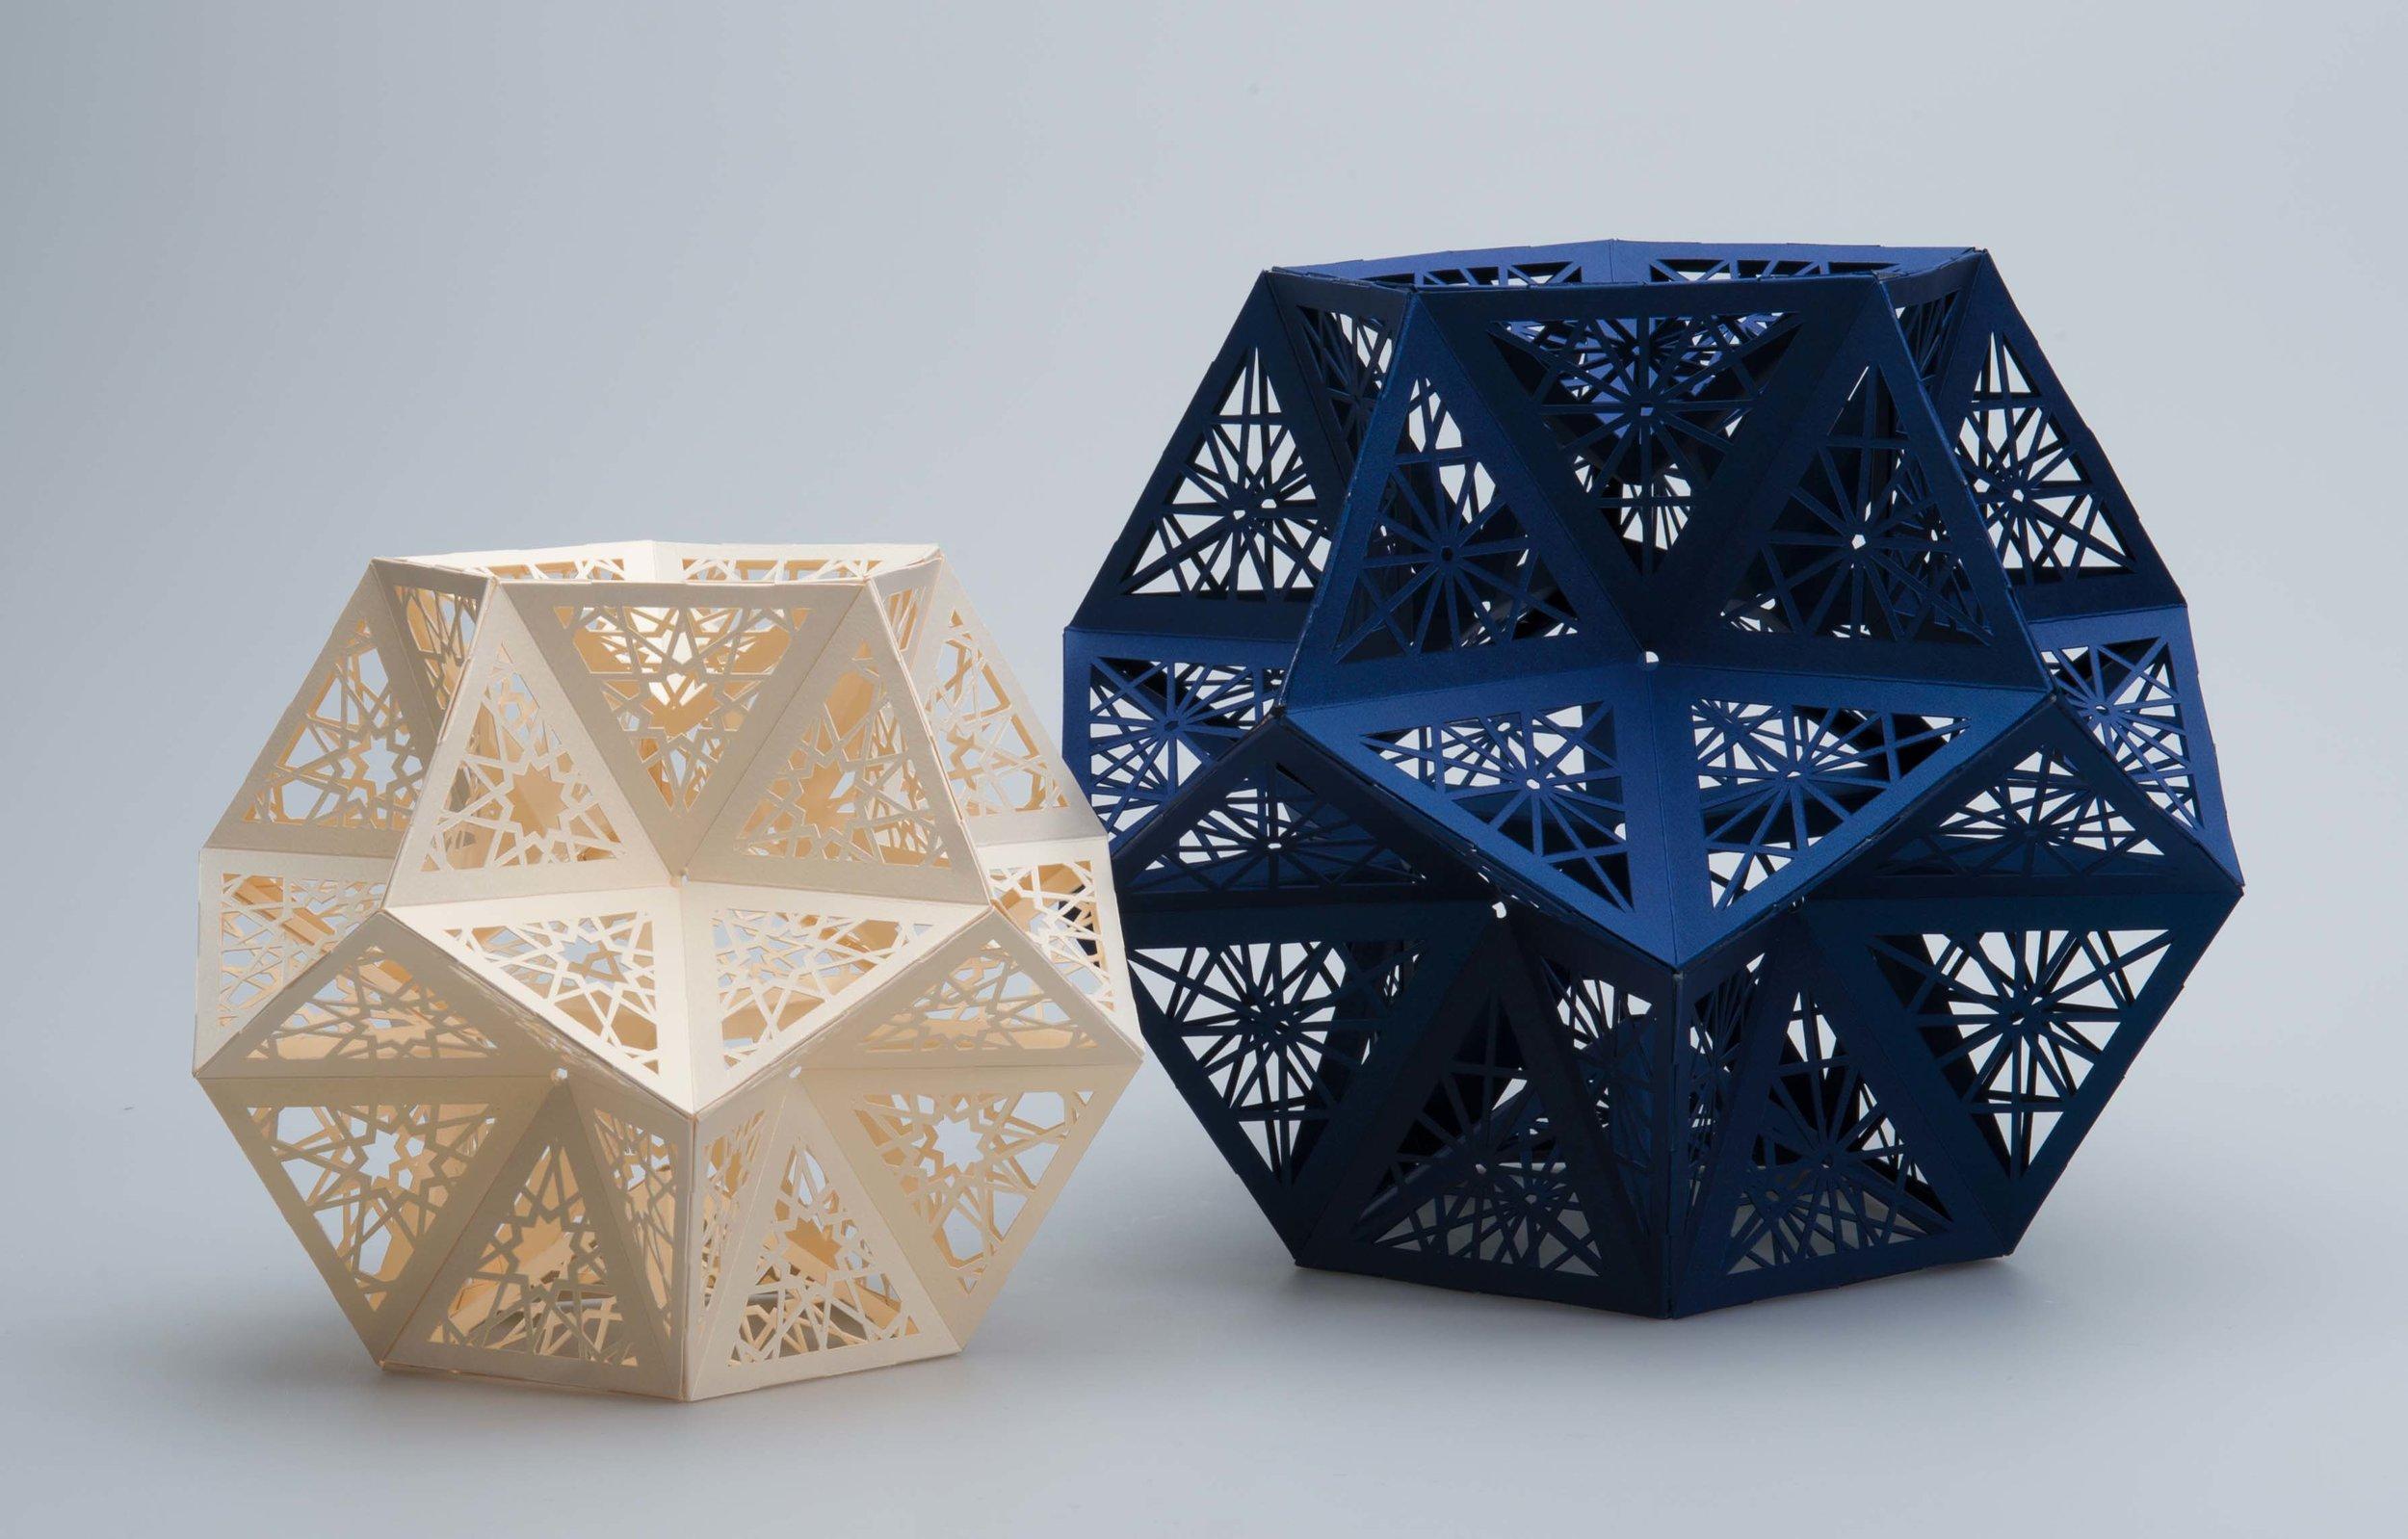 Paper Sculptures - Antalis Storefront